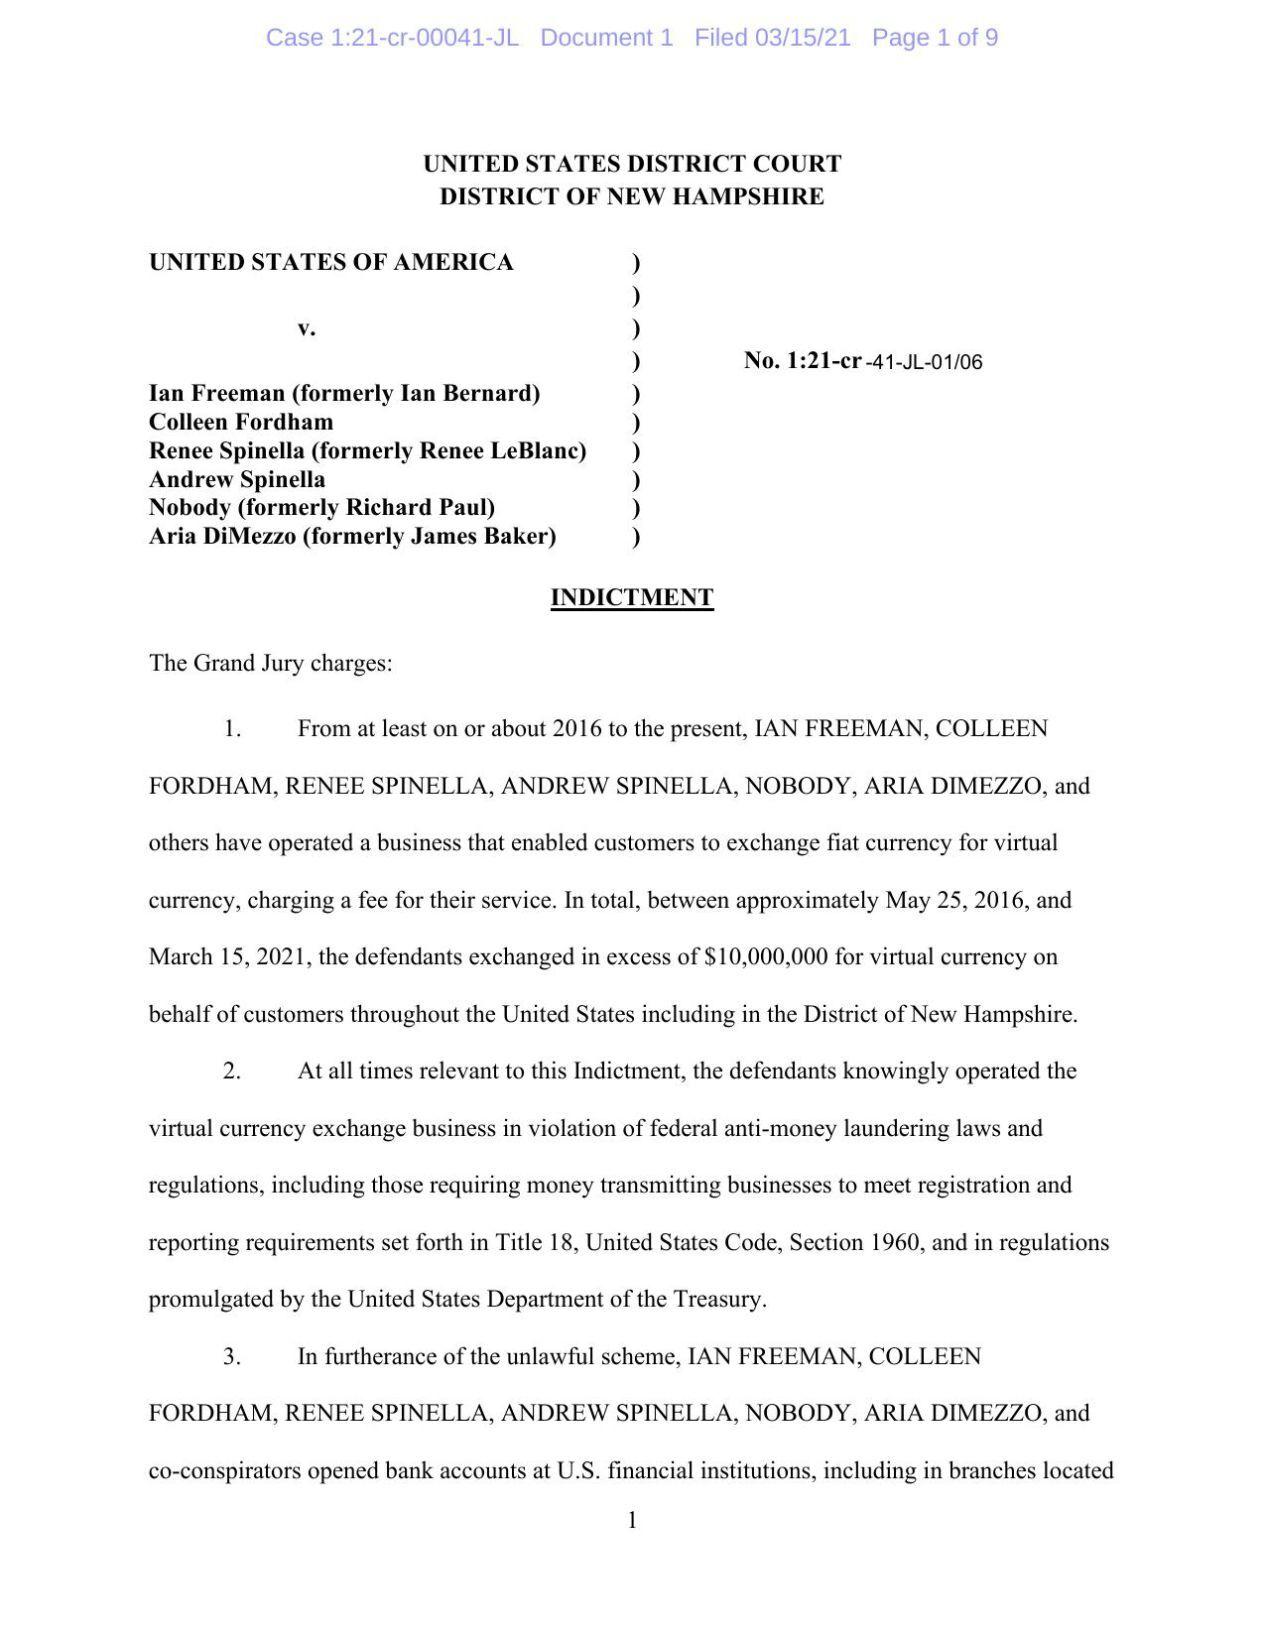 Freeman indictments